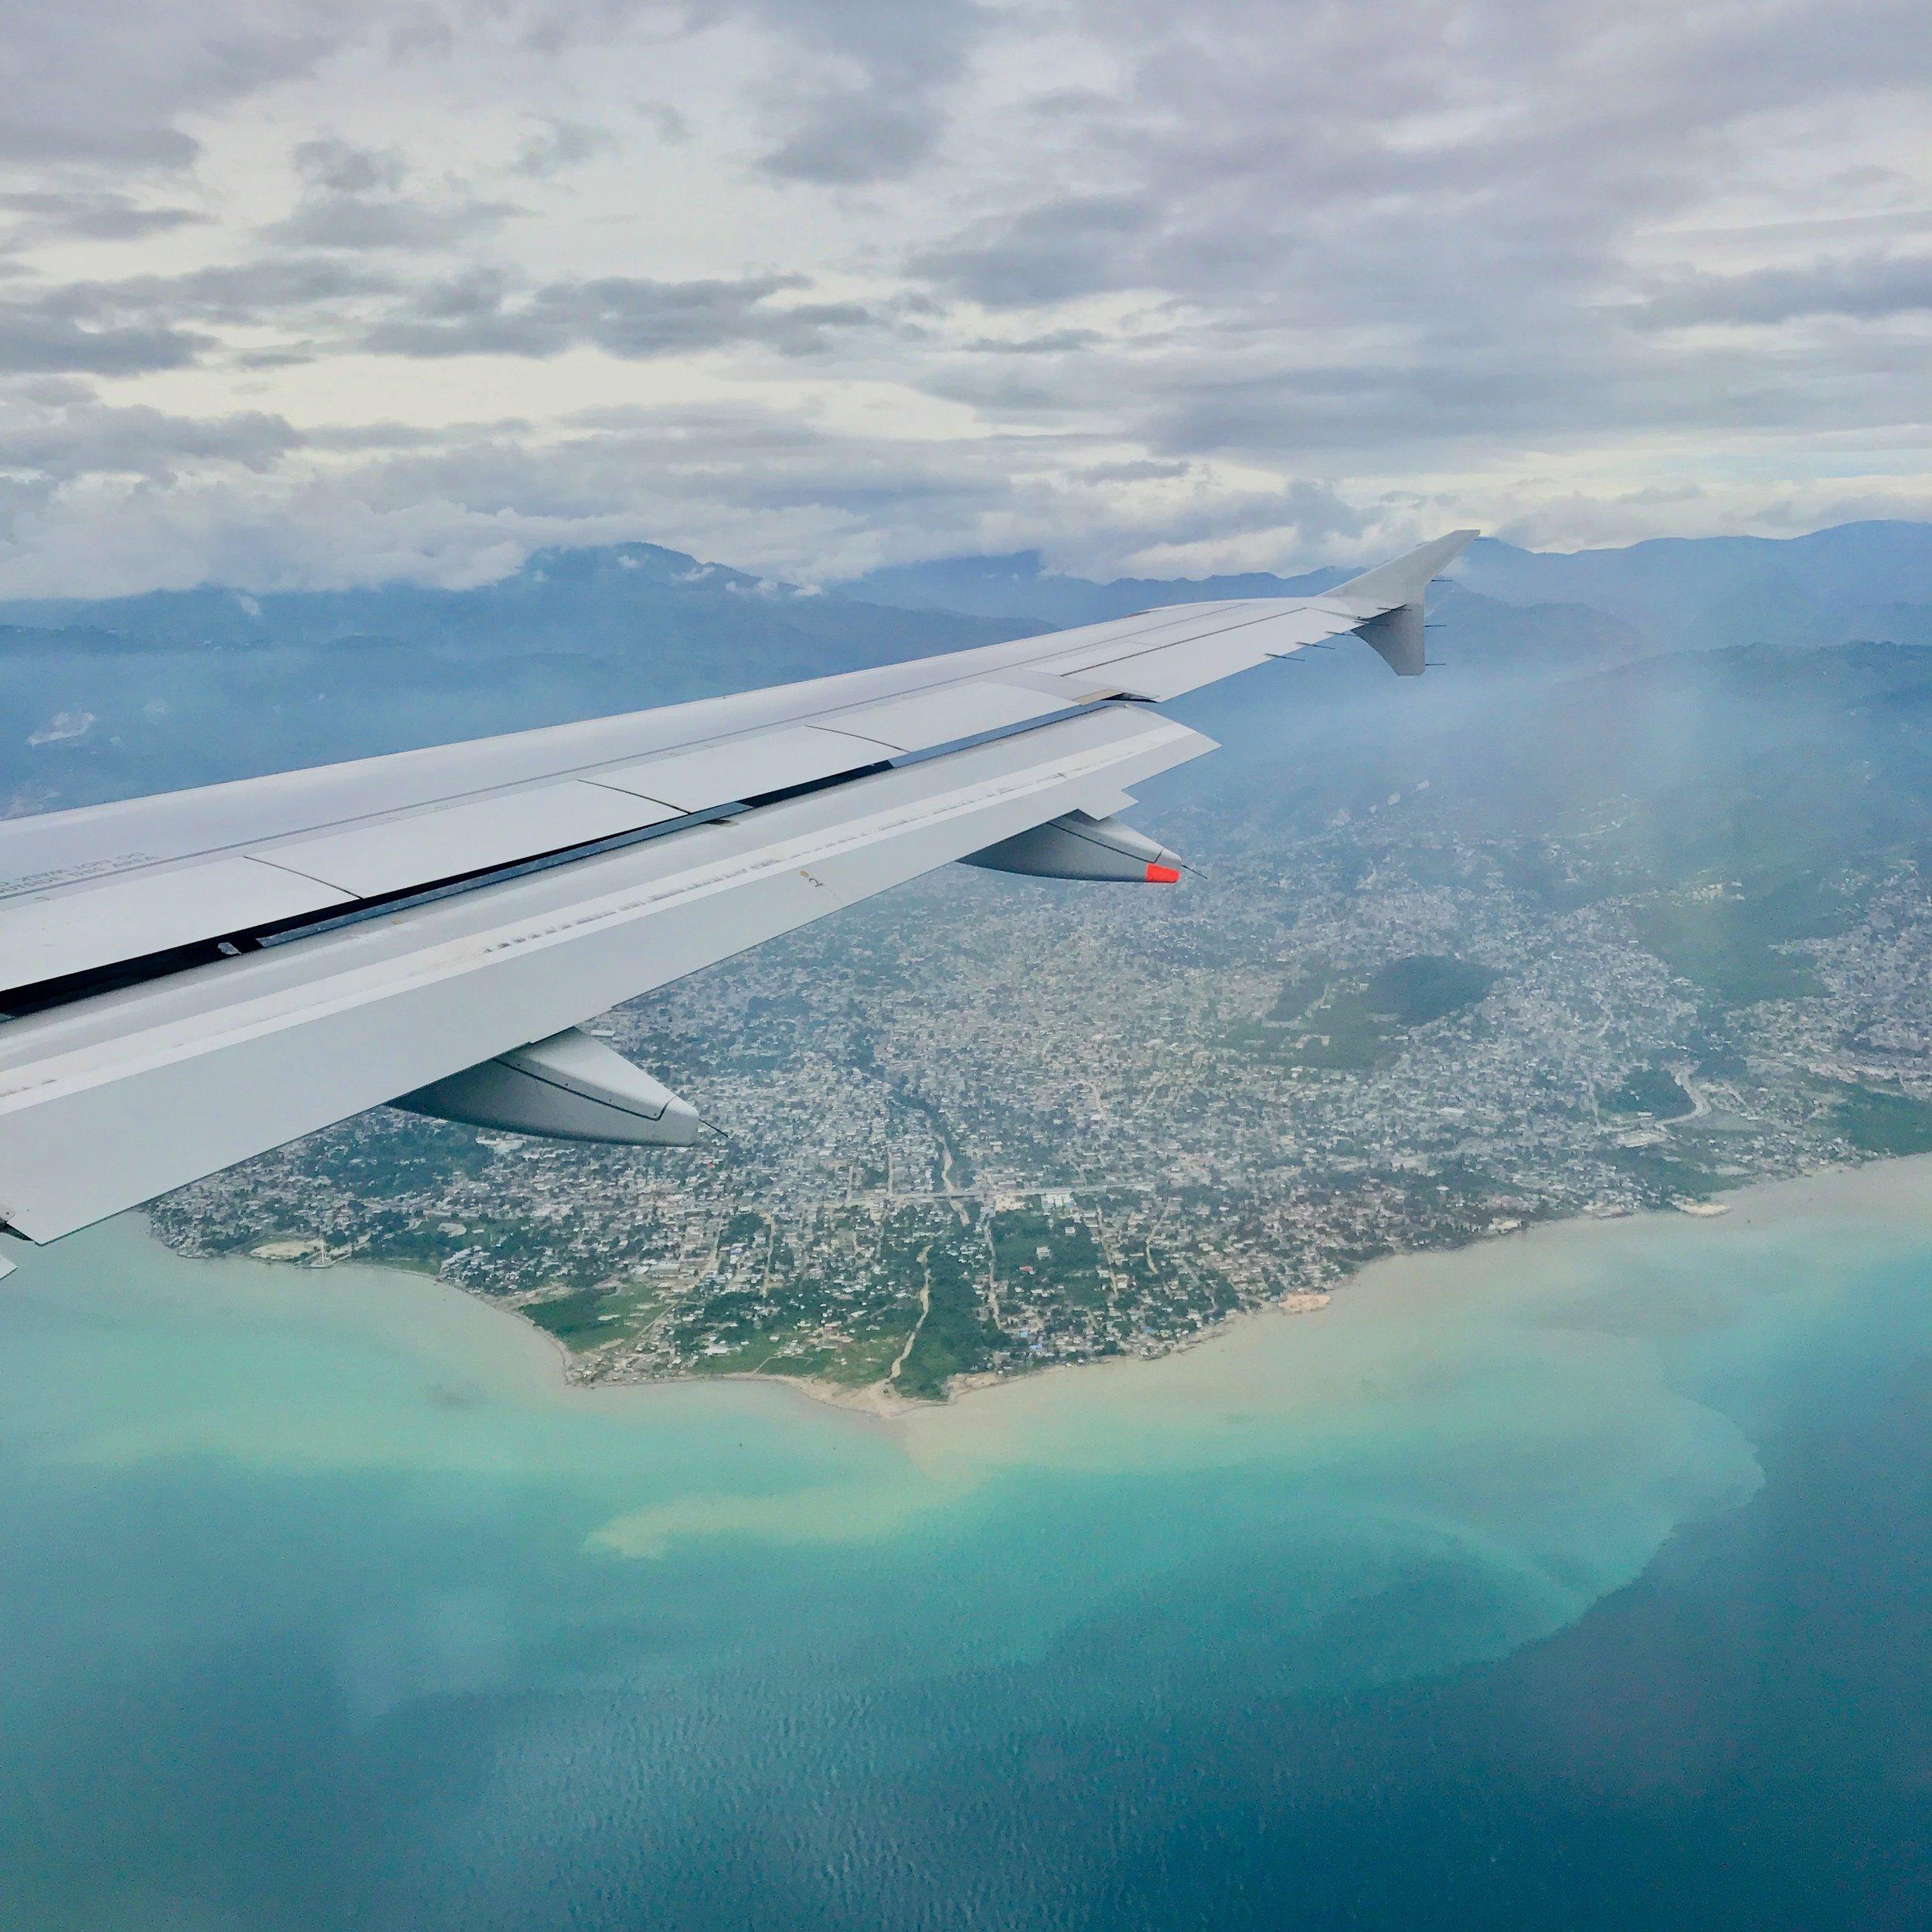 Haiti on the horizon